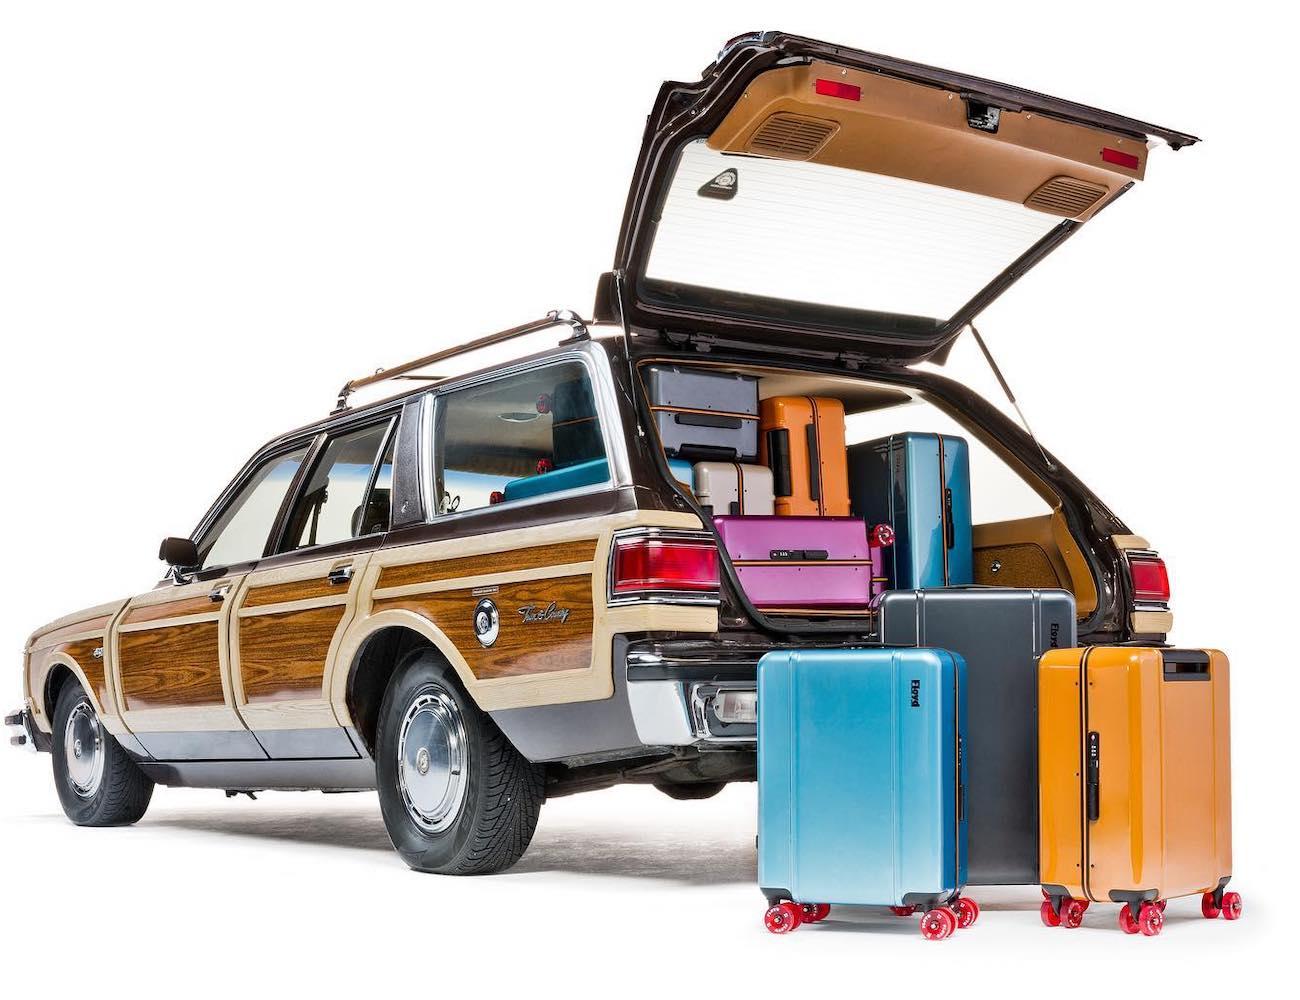 Floyd Cabin Hard Shell Skateboard-Inspired Suitcase offer a high-quality vintage design